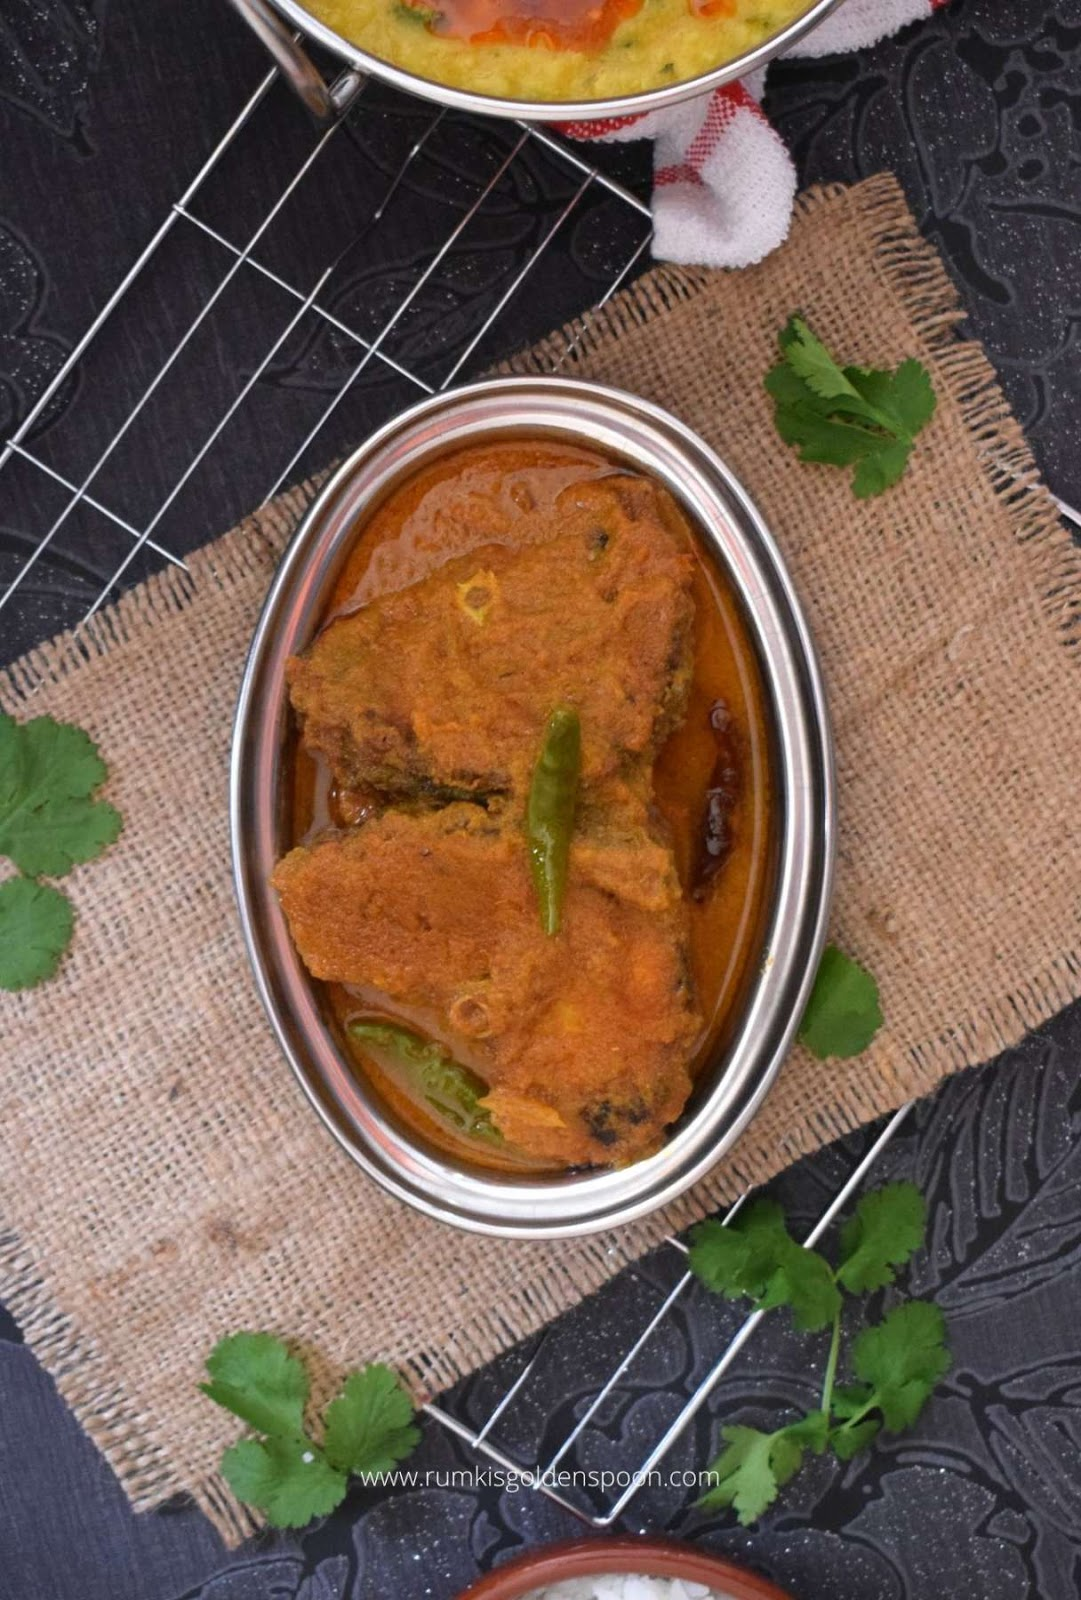 macher kalia, rohu fish curry, fish kalia, macher jhol recipe, rui macher kalia, katla macher kalia, macher kalia recipe, rohu fish curry recipe, fish kalia recipe, rui macher kalia recipe, katla macher kalia recipe, recipe for rohu fish curry, recipe of rohu fish curry, fish kalia bengali recipe, fish kalia recipe in bengali, rohu fish recipe bengali, rui macher kalia bengali recipe, how to make rohu fish curry, fish kalia recipe step by step, macher kalia recipe bengali, how to make fish kalia, rohu fish curry in bengali style, fish kalia recipe in hindi, katla fish kalia, bengali macher kalia, fish kalia recipe bengali style, rohu fish kalia, fish kalia bengali style, rui macher kalia in bengali style, how to make macher kalia, rui macher kalia Bengali, bengali fish curry, bengali fish curry recipe, recipe for bengali fish curry, Bengali recipe fish, Bengali recipes fish, Bengali recipe for fish, Bengali recipe of fish, Bengali fish recipe, macher jhol, bengali fish curry recipe, fish curry recipe, fish curries, bengali recipes, bengali food, traditional bengali food, Rumki's Golden Spoon